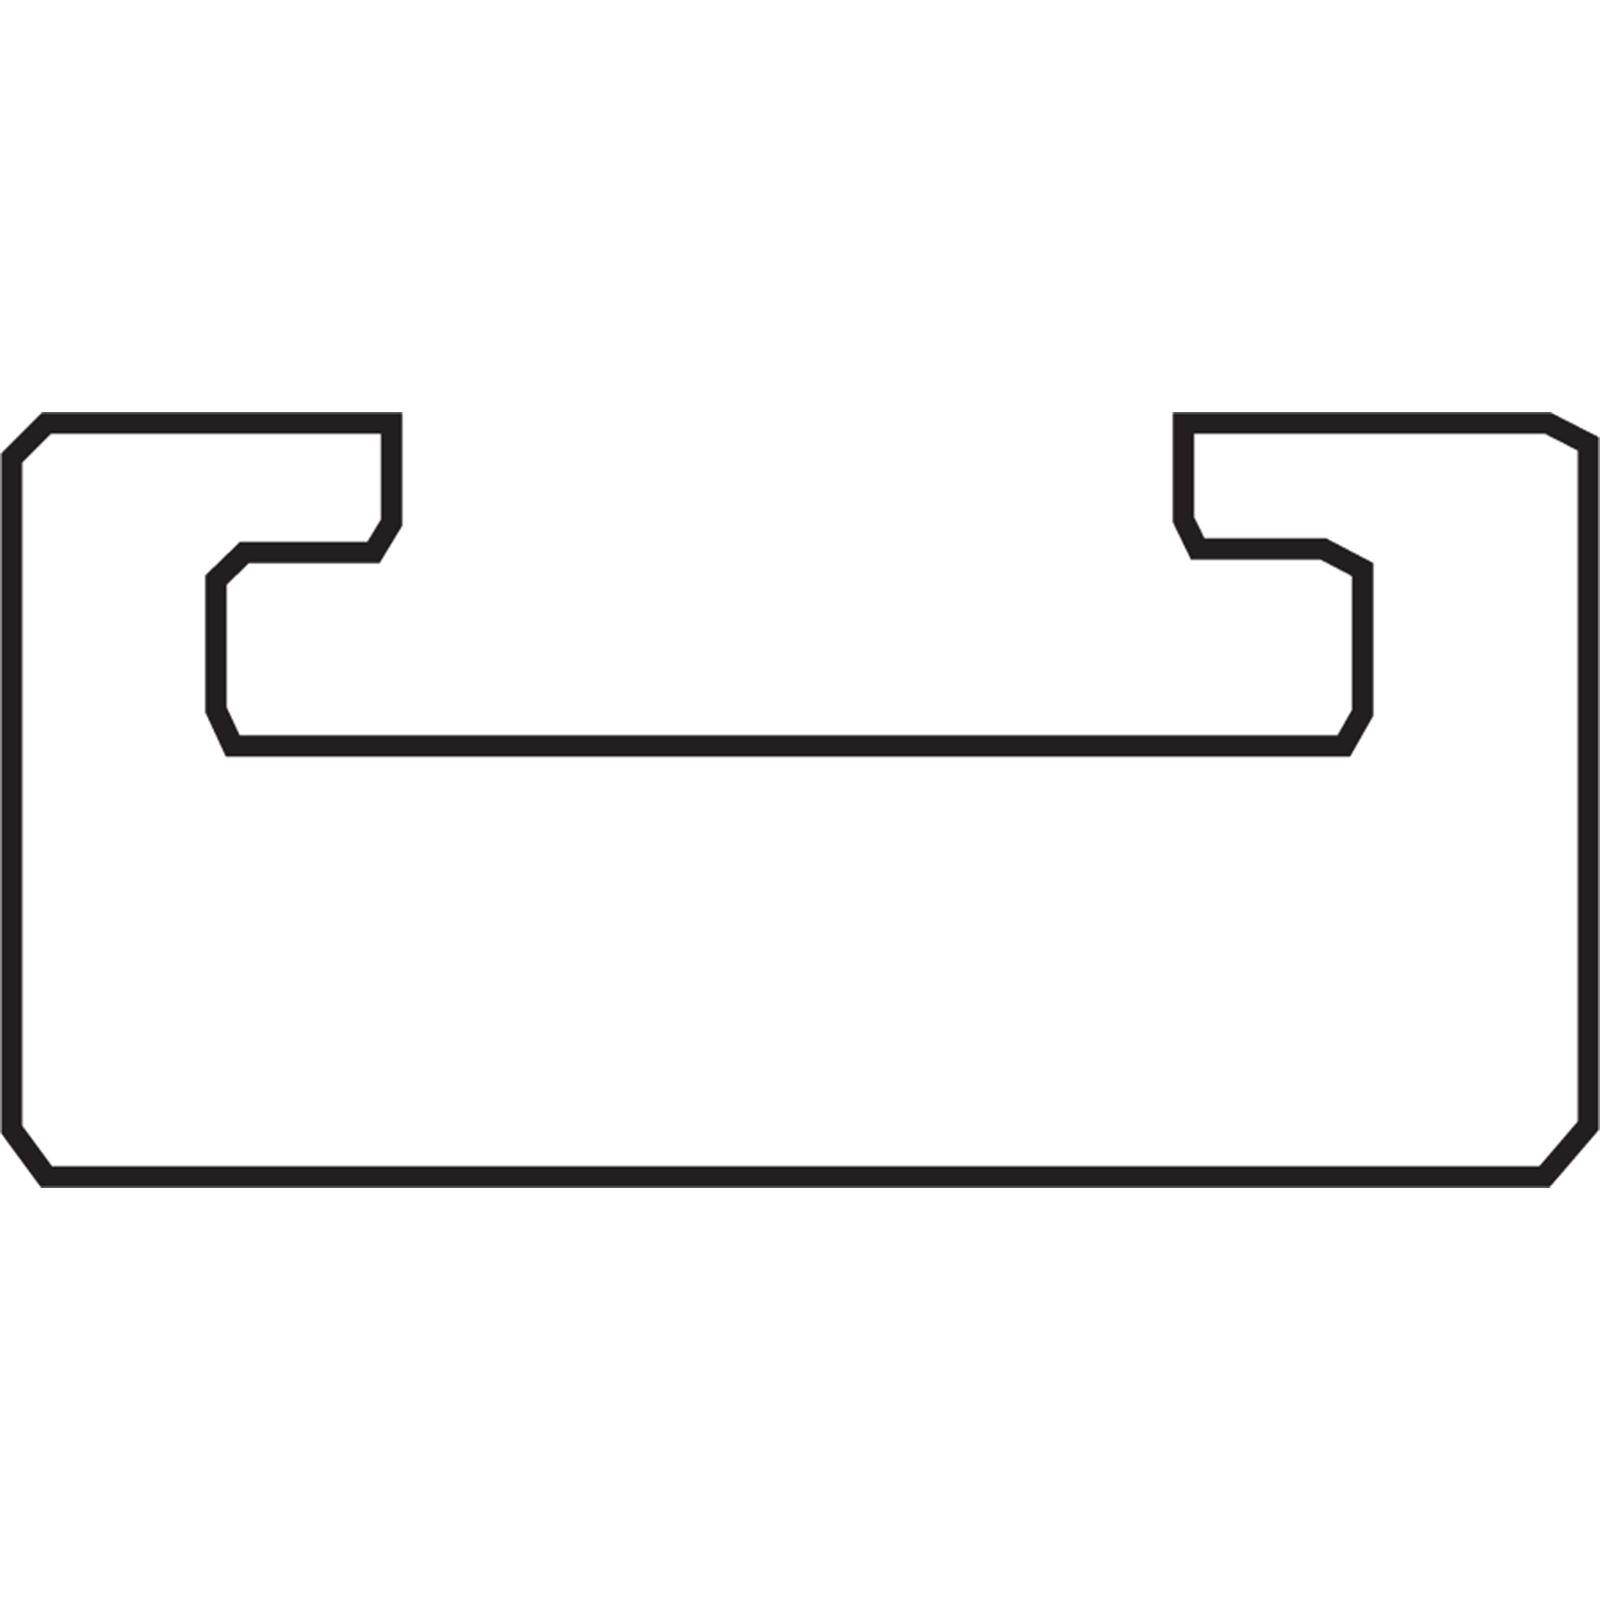 "Garland Black Replacement Slide - UHMW - Profile 16 - Length 46.75"" - Yamaha"